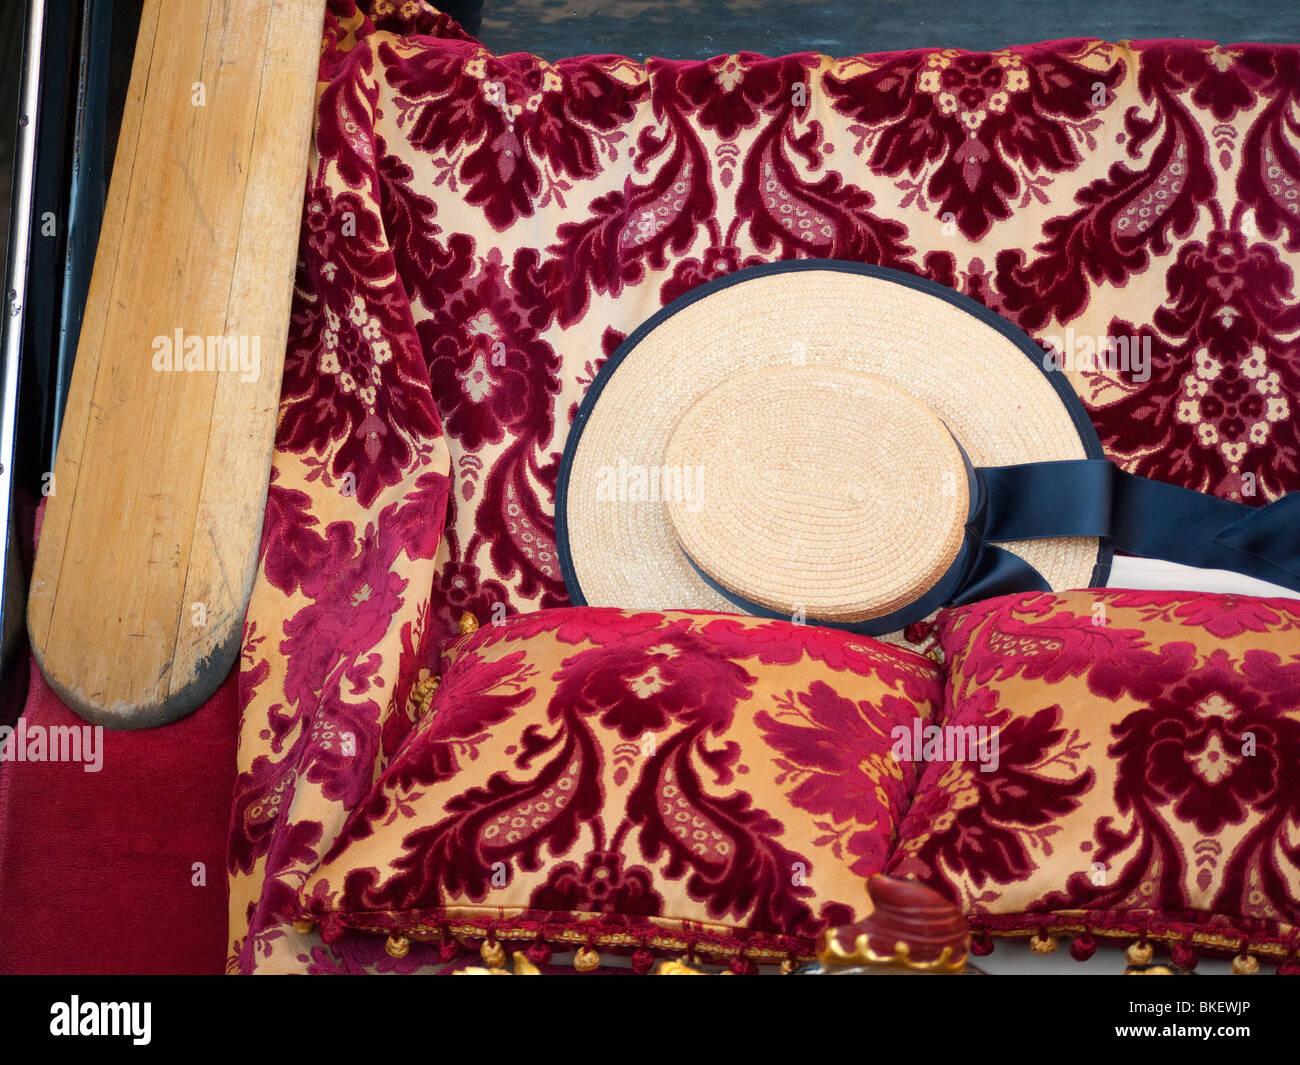 Detalle del tradicional sombrero de paja de gondolero en góndola en Venecia  Italia 4b86d5008eb